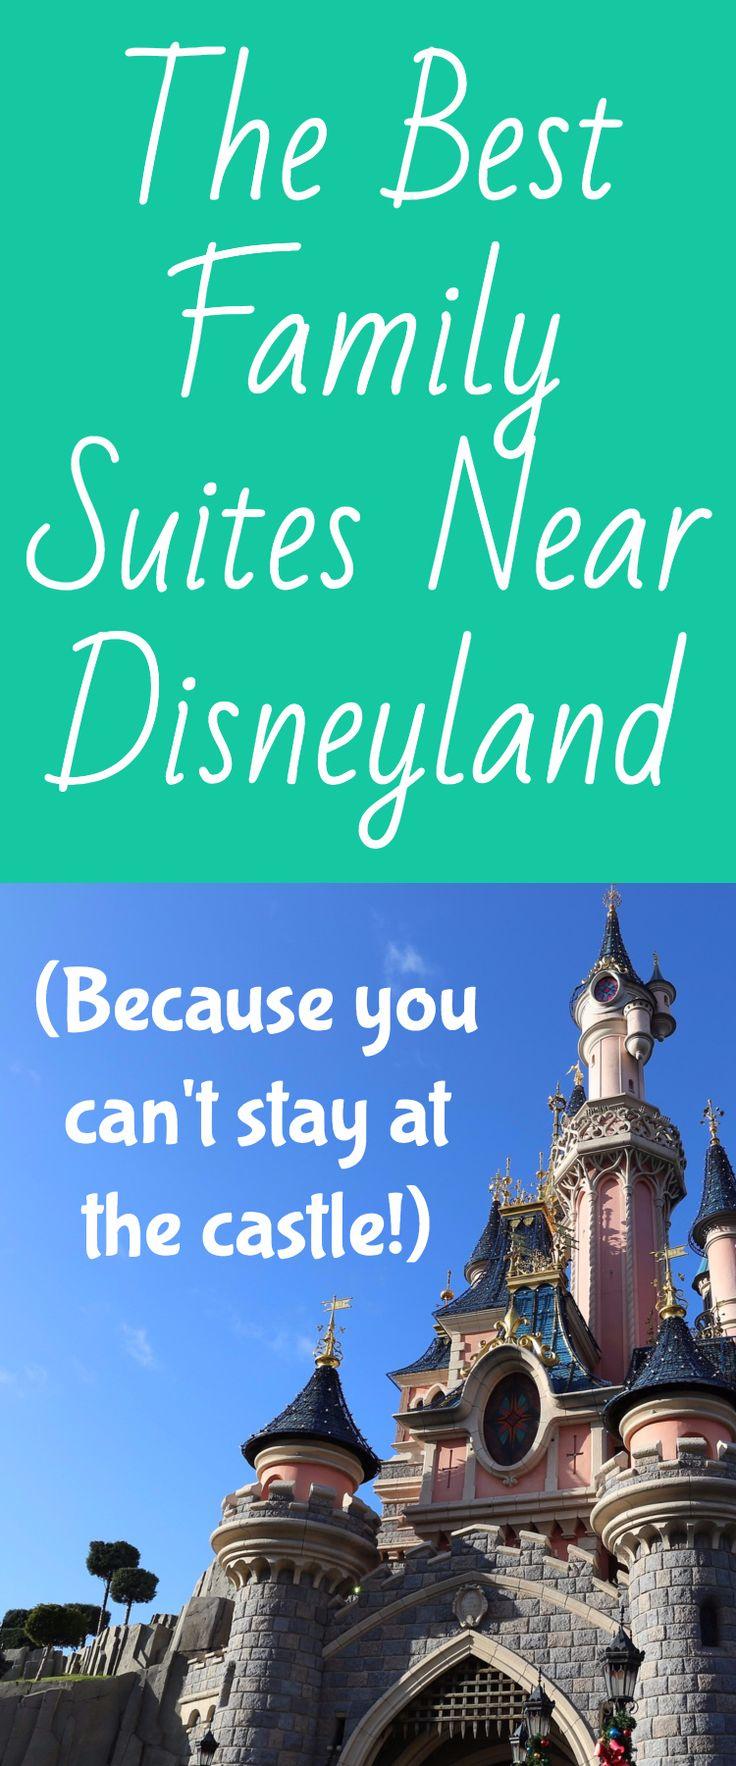 Disneyland / DIsneyland Hotels / Family Disneyland Trip / Planning Disney Trip / Disney #Disneyland #Disney #California